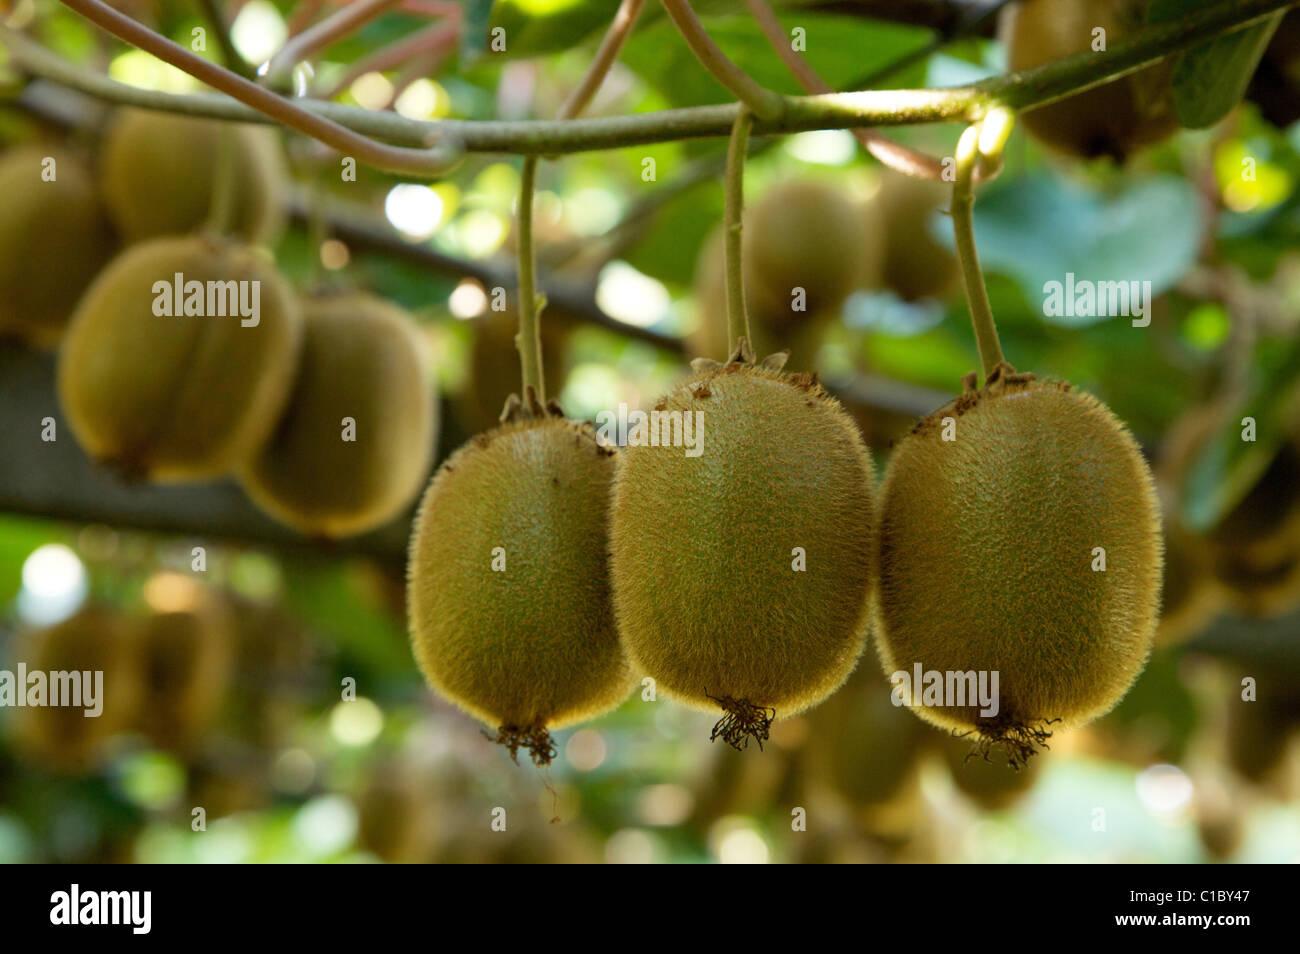 Kiwis fruits plant, Trentino Alto Adige, Italy, Europe - Stock Image